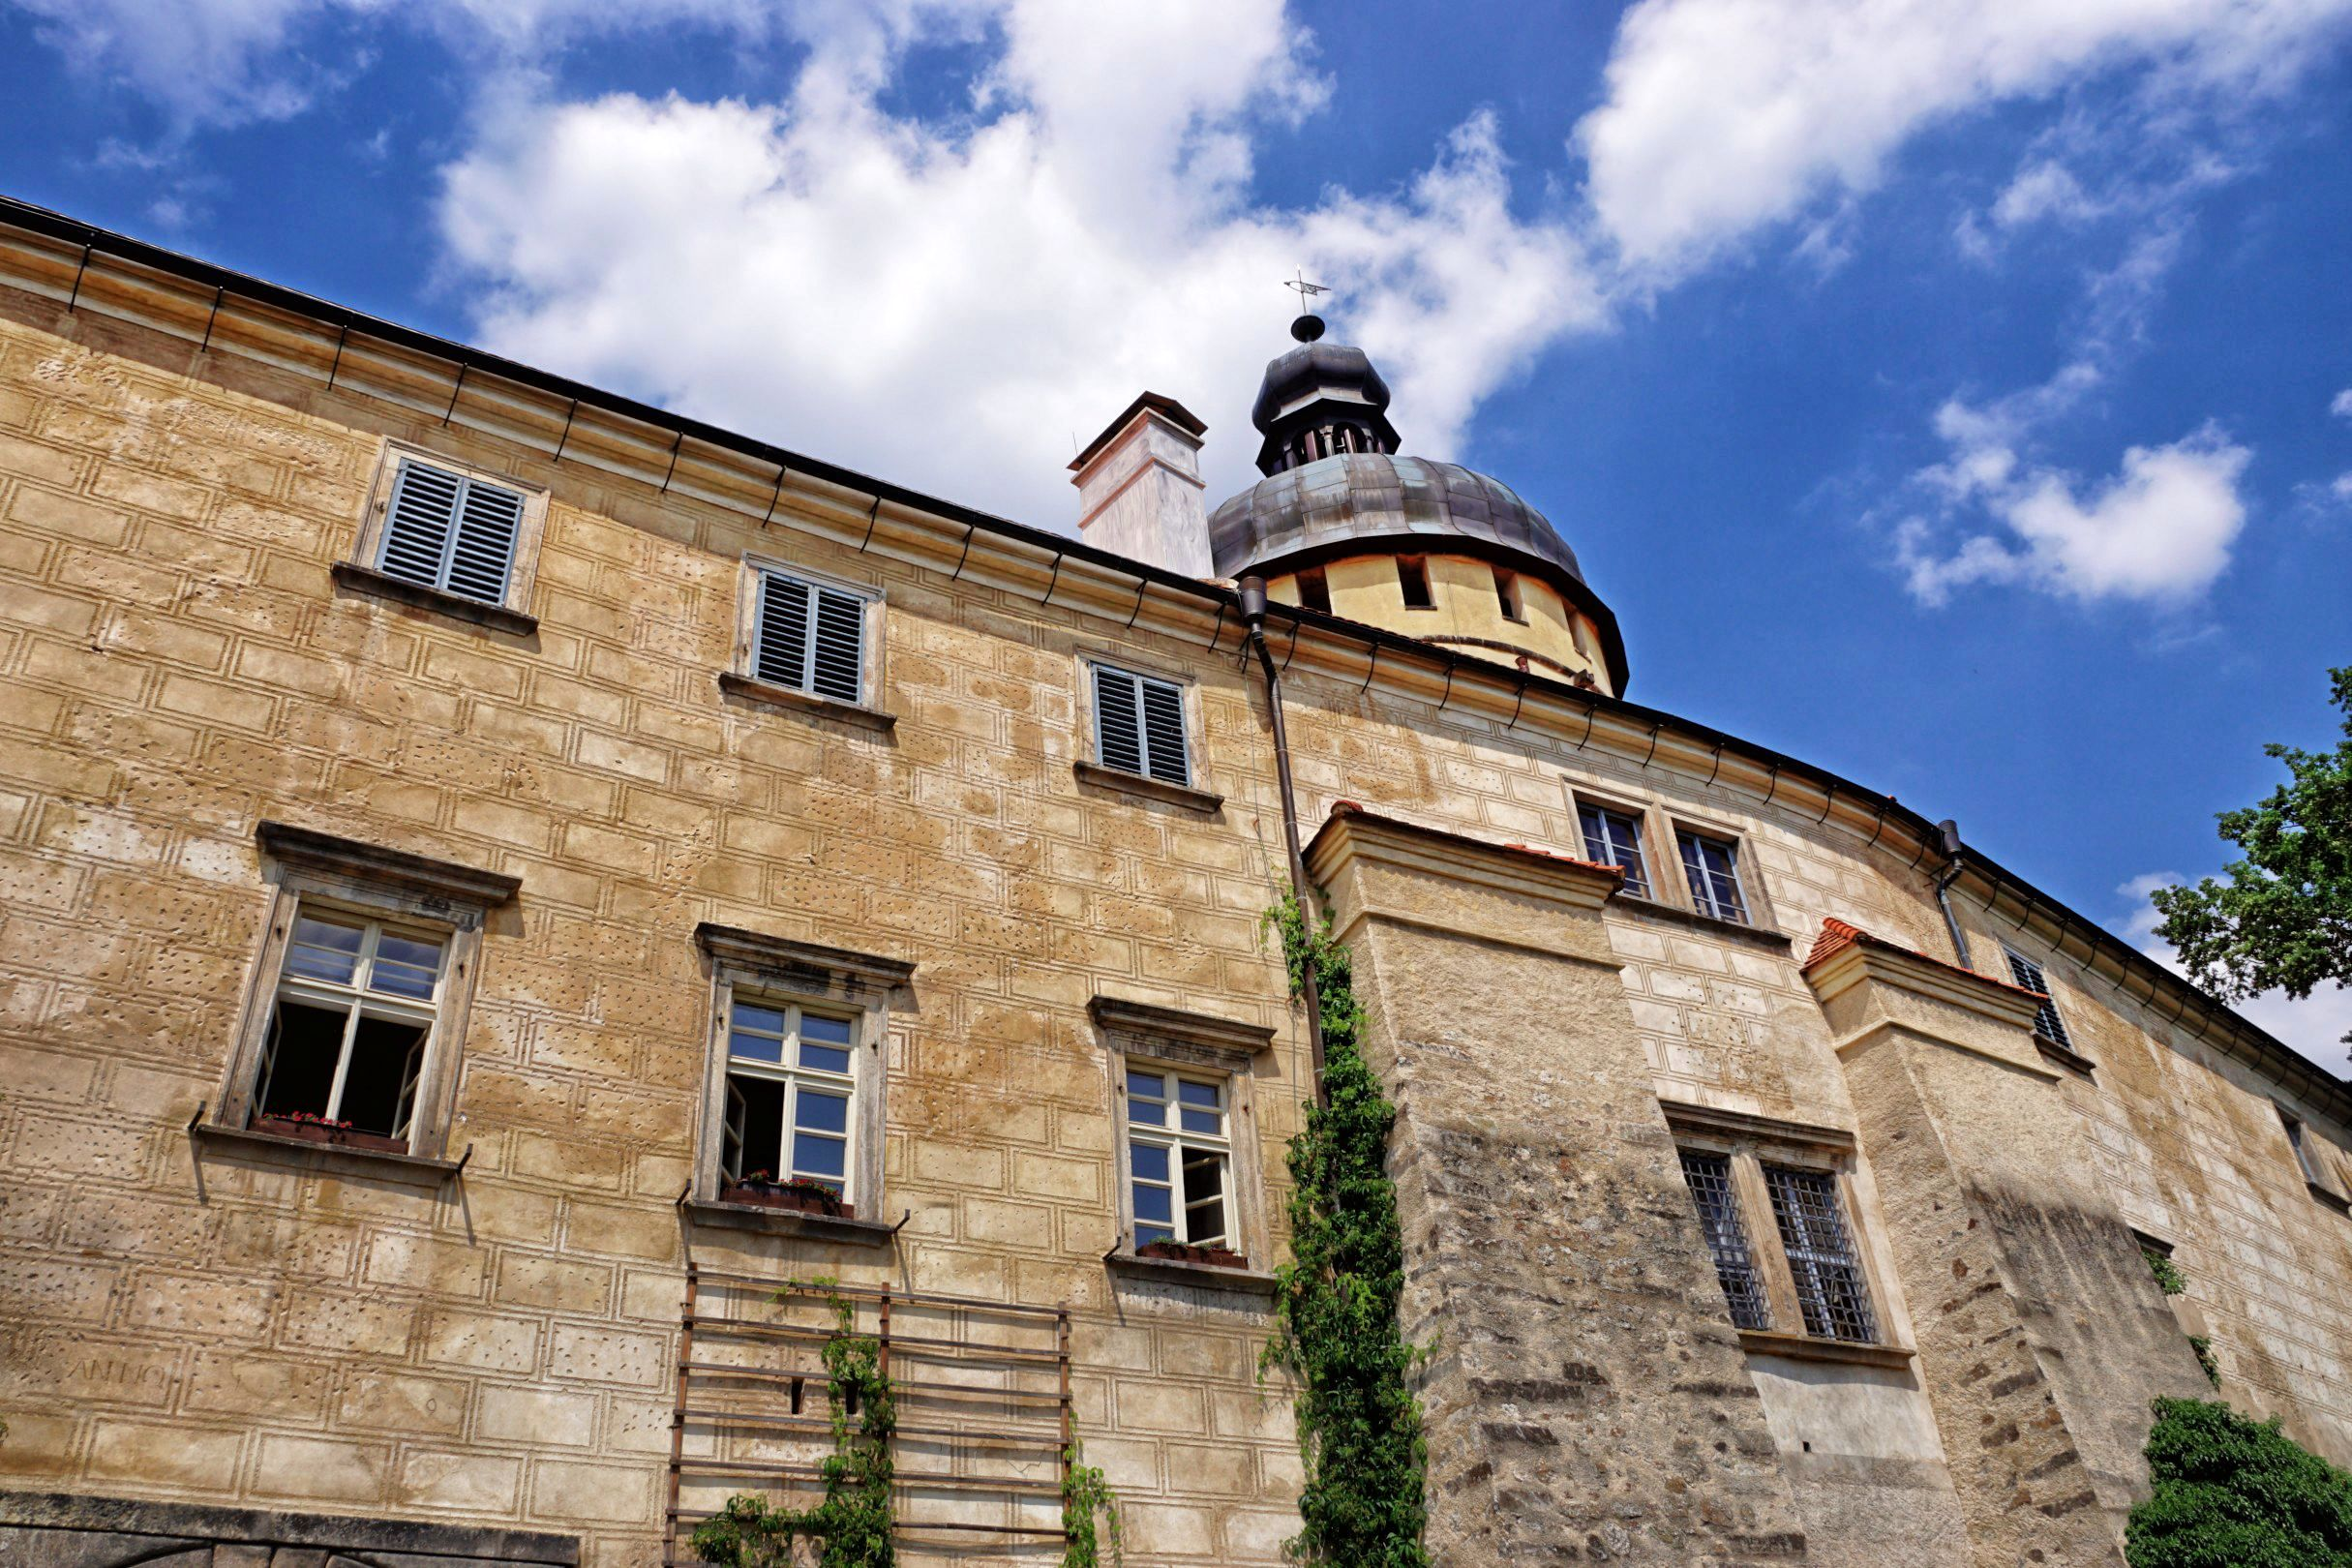 Zamek Grabstejn po mozolnej wspinaczce